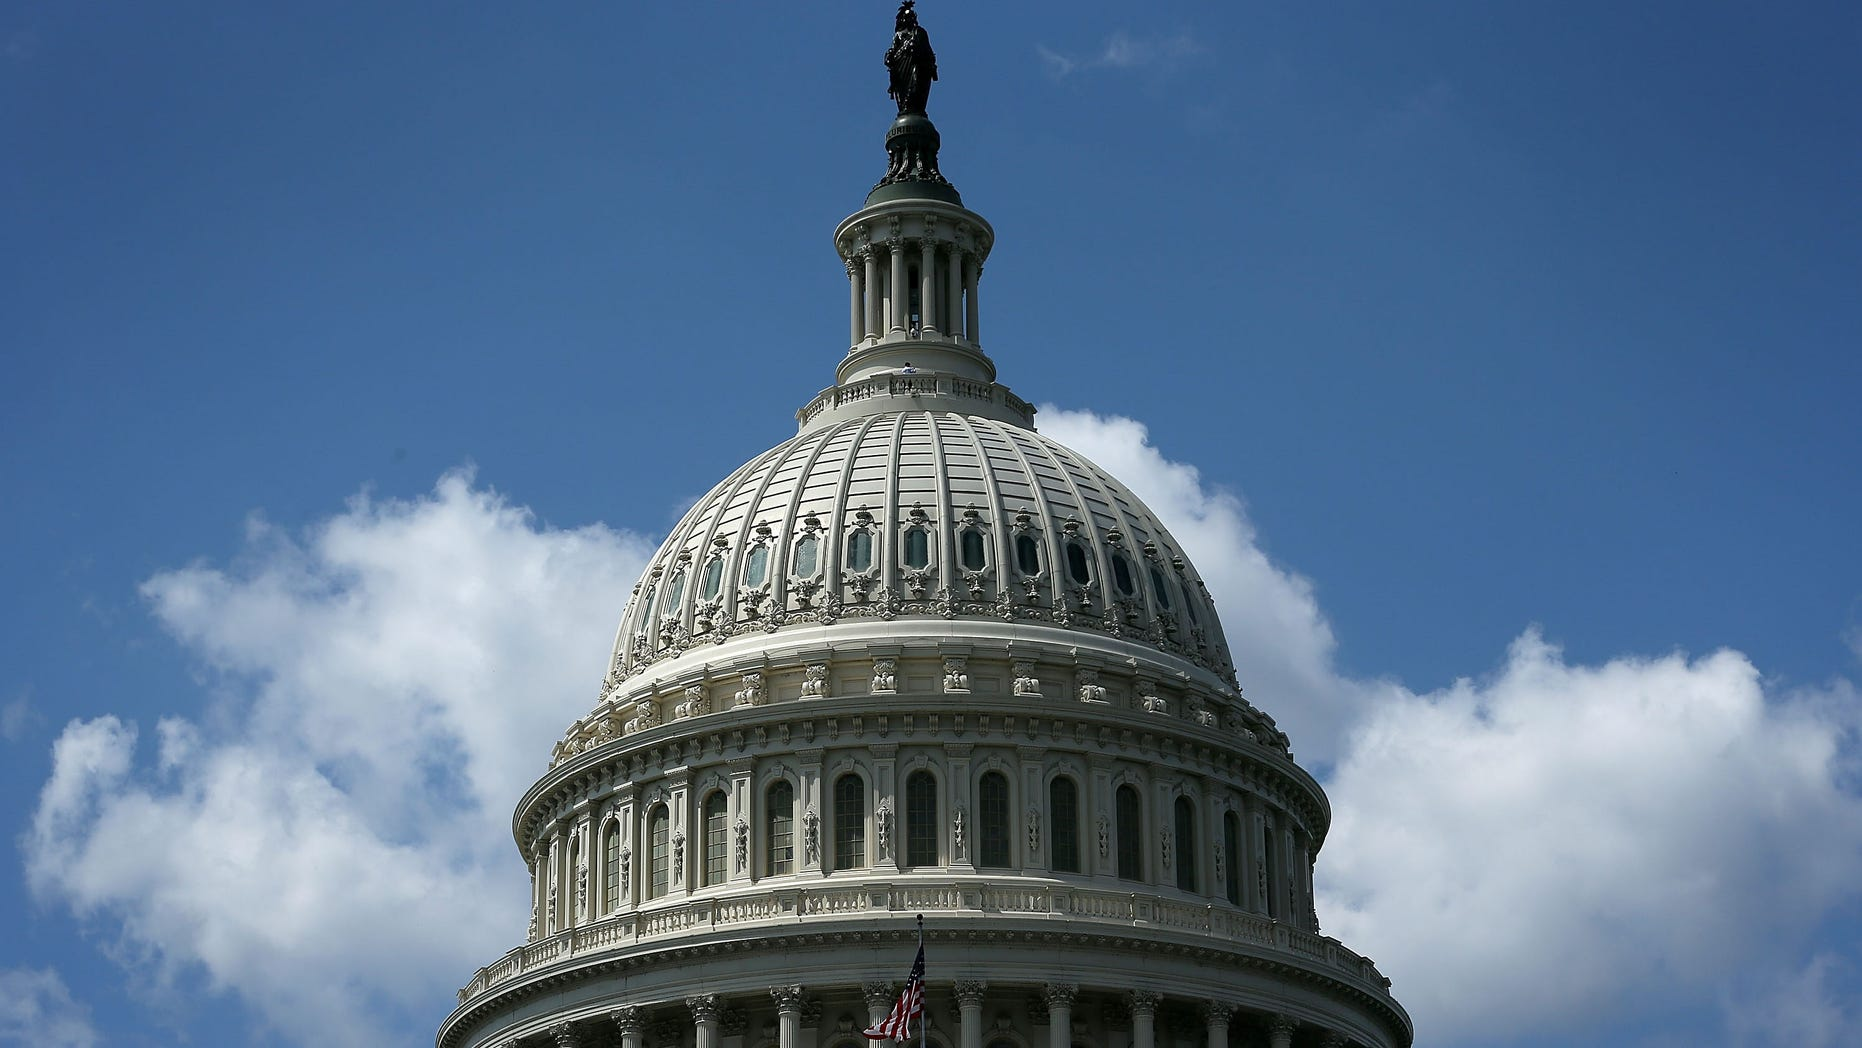 > on August 28, 2012 in Washington, DC.